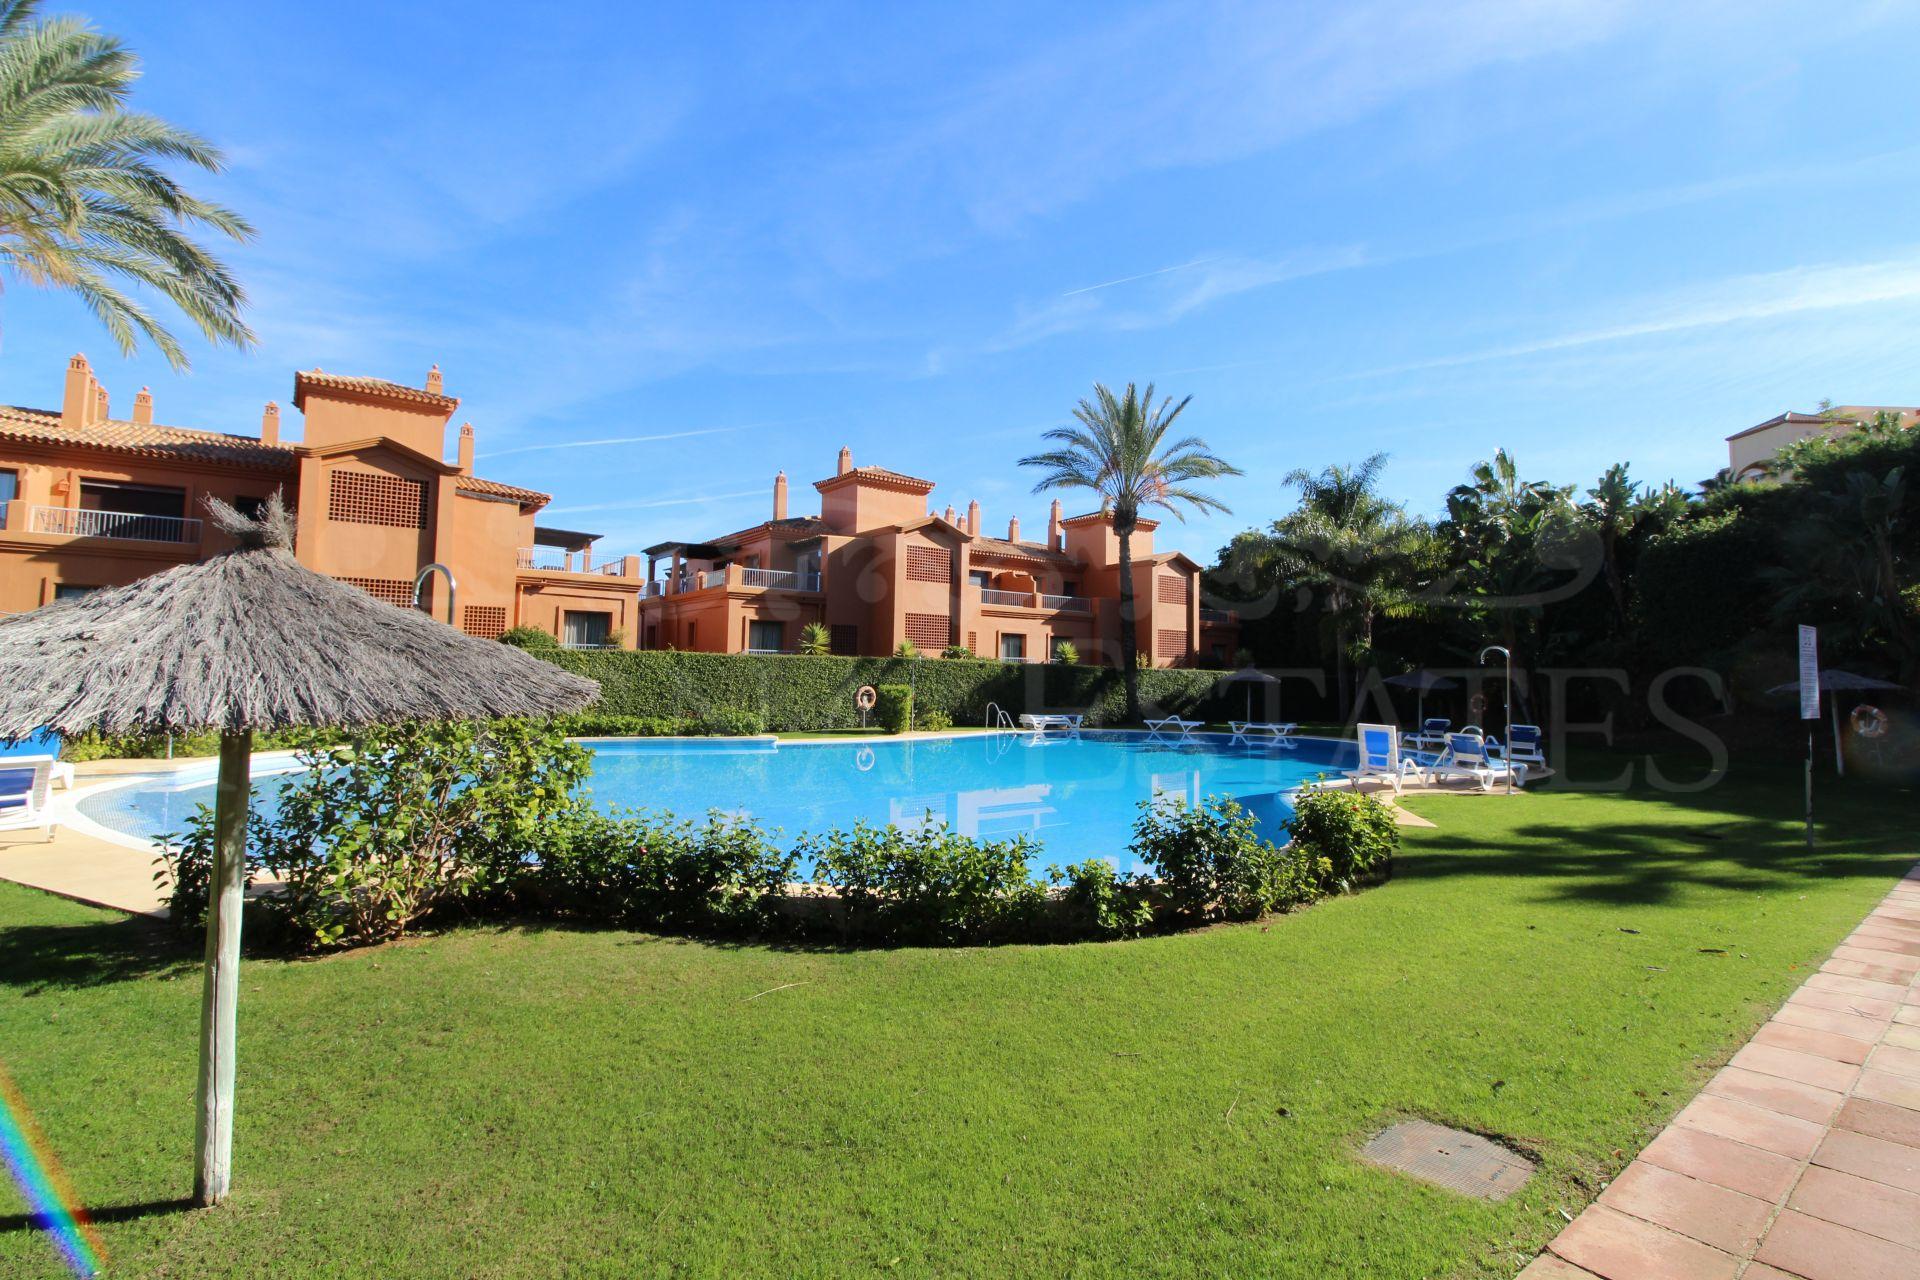 Apartment with spectacular sea views in Benataya, Estepona